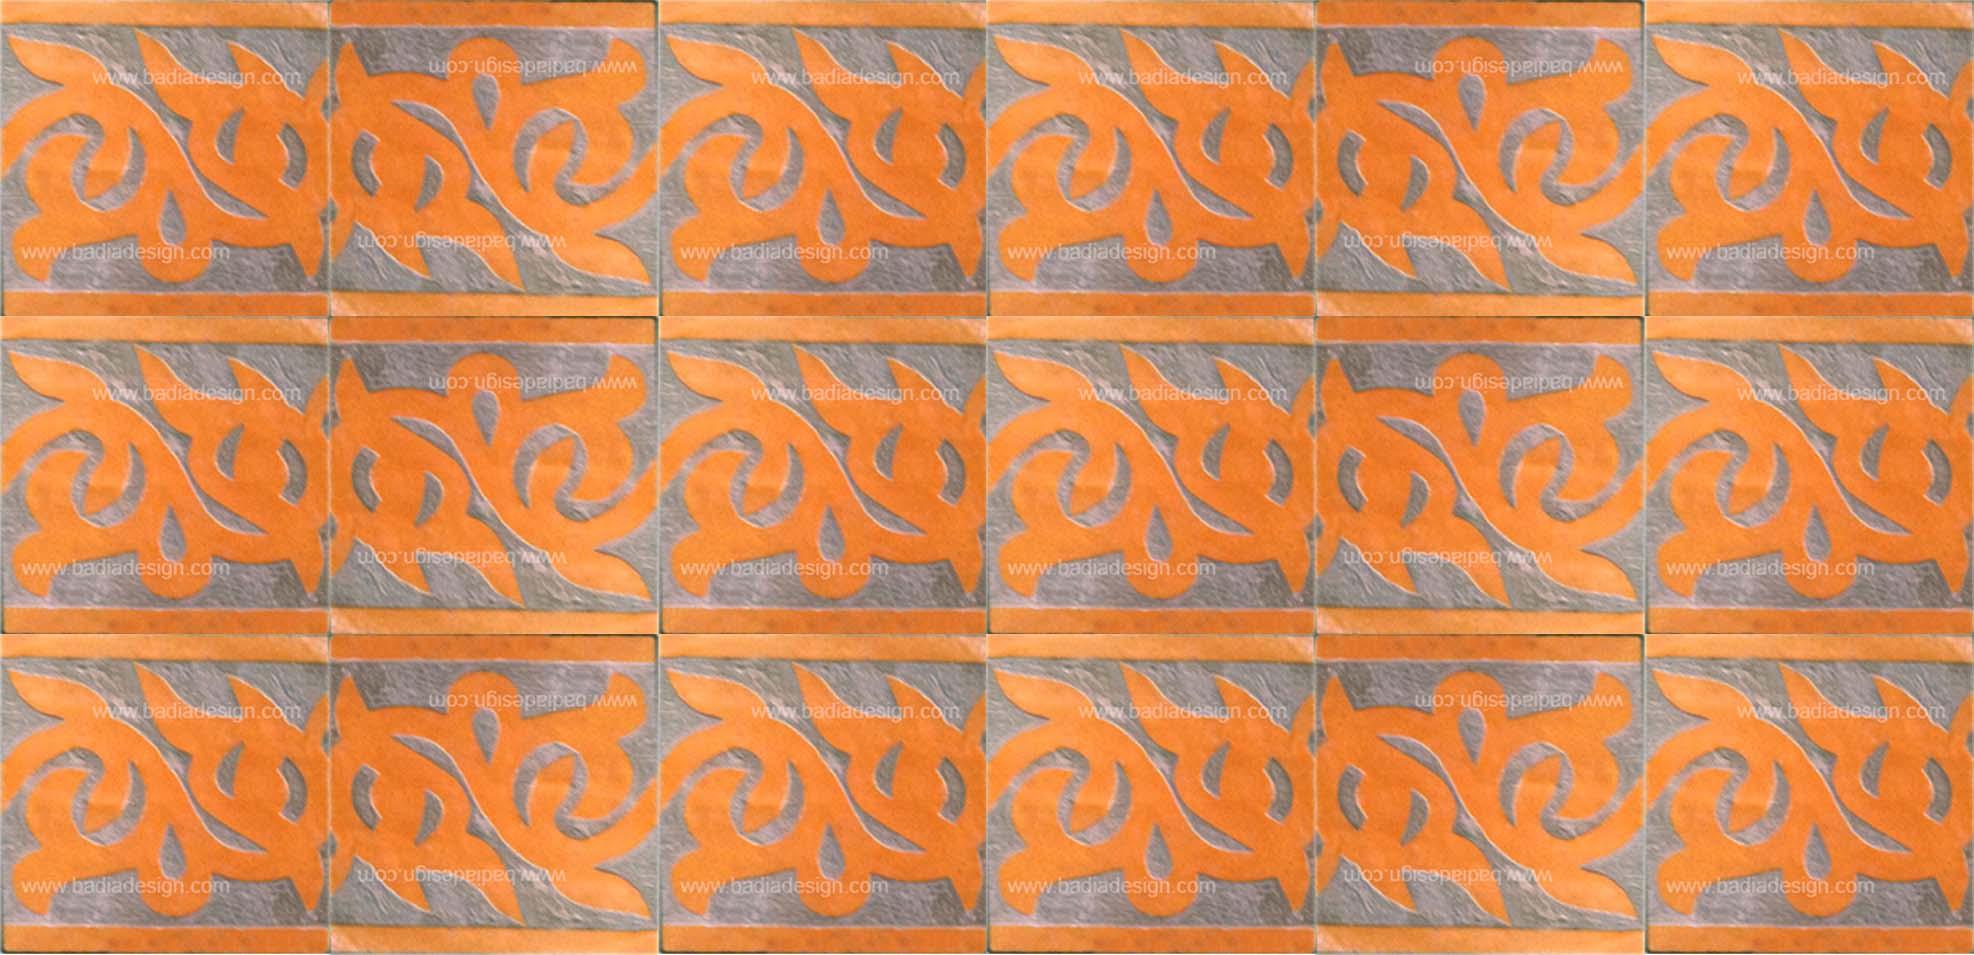 Hand Chiseled Tile from Badia Design Inc.